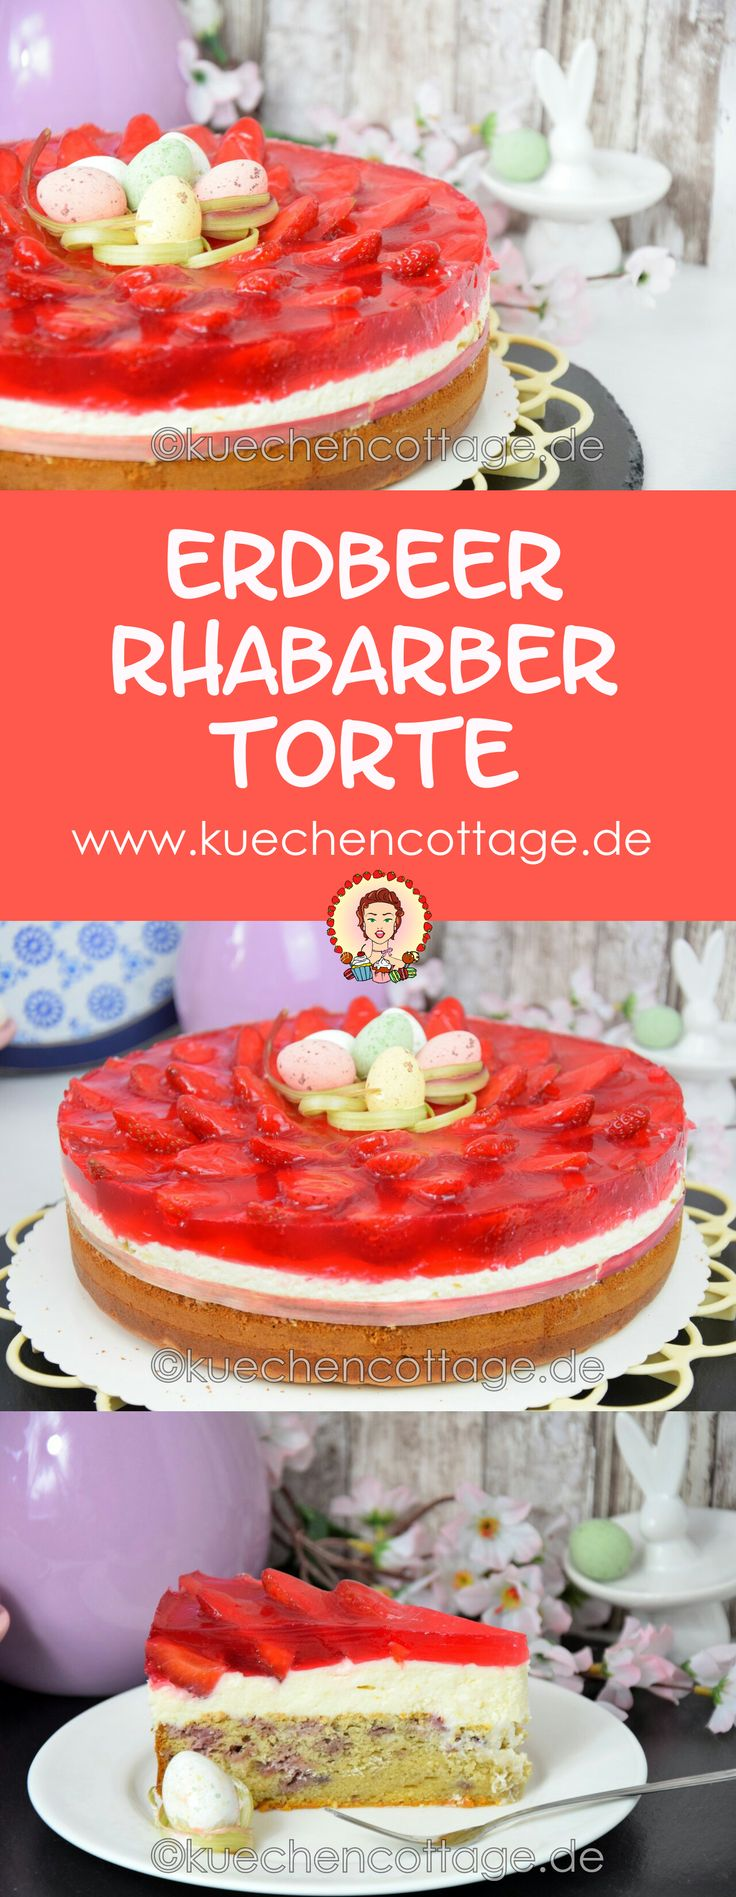 Feine Erdbeer-Rhabarber-Torte | Ostern & Frühling | Mit YouTube Video Anleitung #ostertorte #ostern #torte #cake #frühling #frühlingstorte #erdbeertorte #Rhabarber #erdbeeren #backen #ideen #rezept #rezeptideen #osterzeit #foodblog #food #blog #blogger #foodporn #fotografie  #erdbeertorte  www.kuechencottage.de